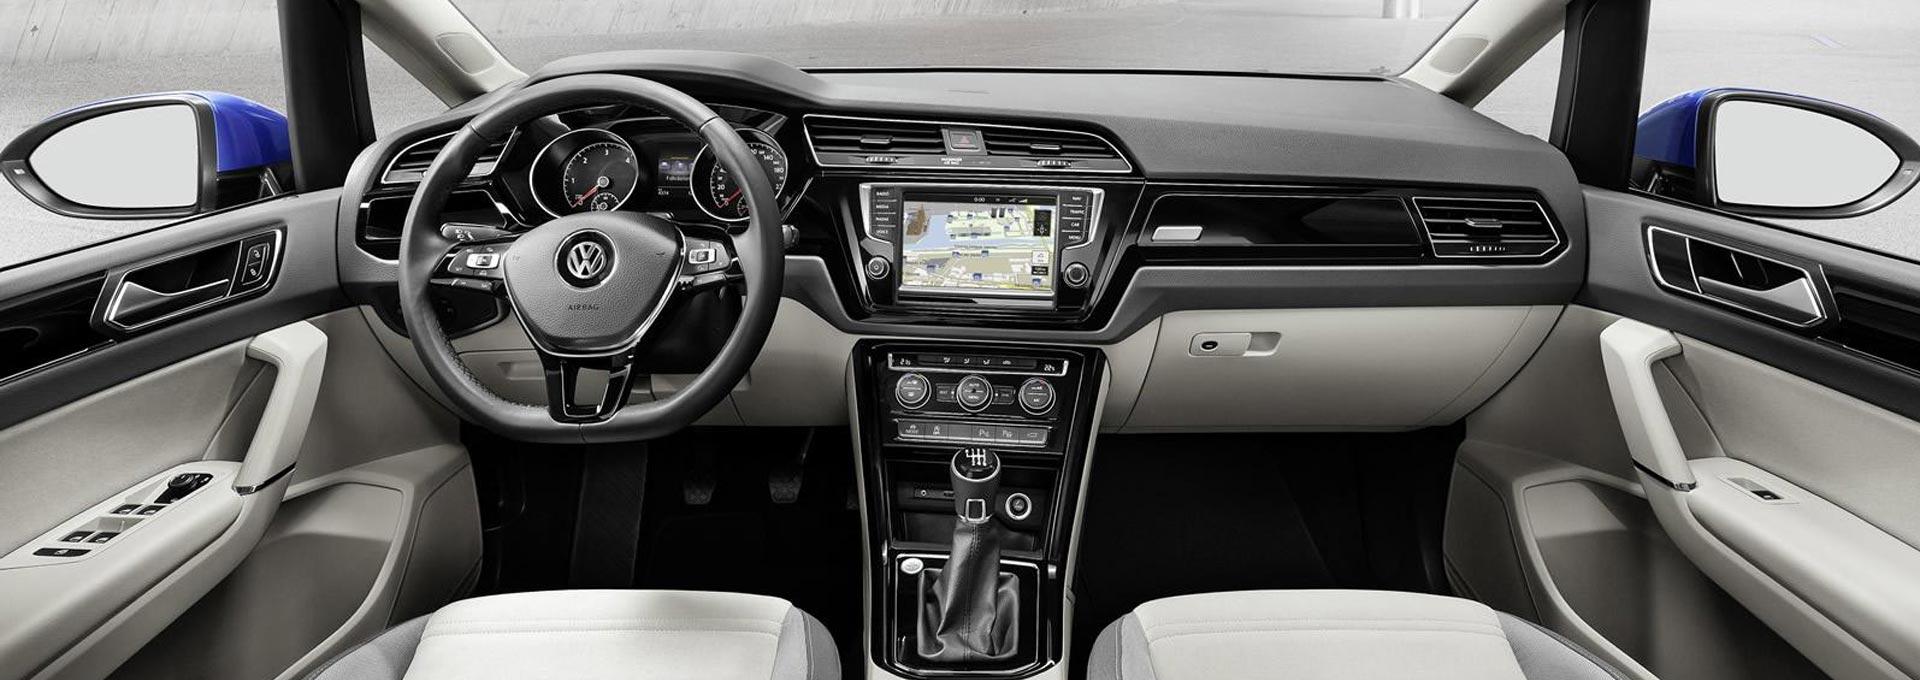 Volkswagen predstavlja novi Touran